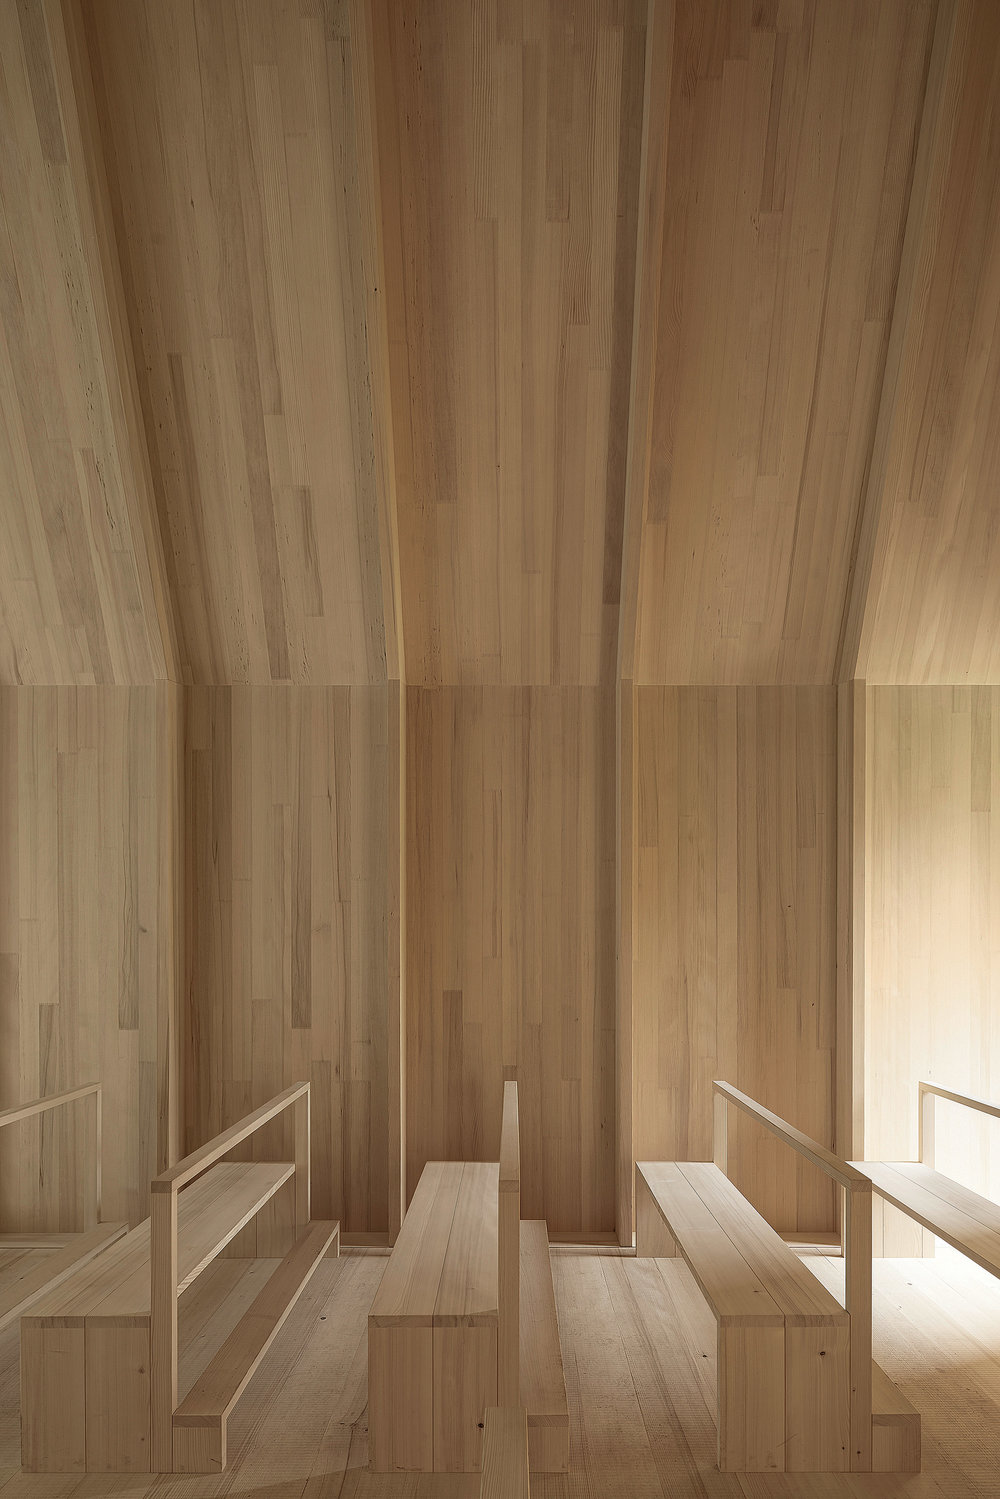 kapelle-salgenreute-bernardo-bader-krumbach-architecture-cultural-chapel-germany_dezeen_2364_col_4.jpg